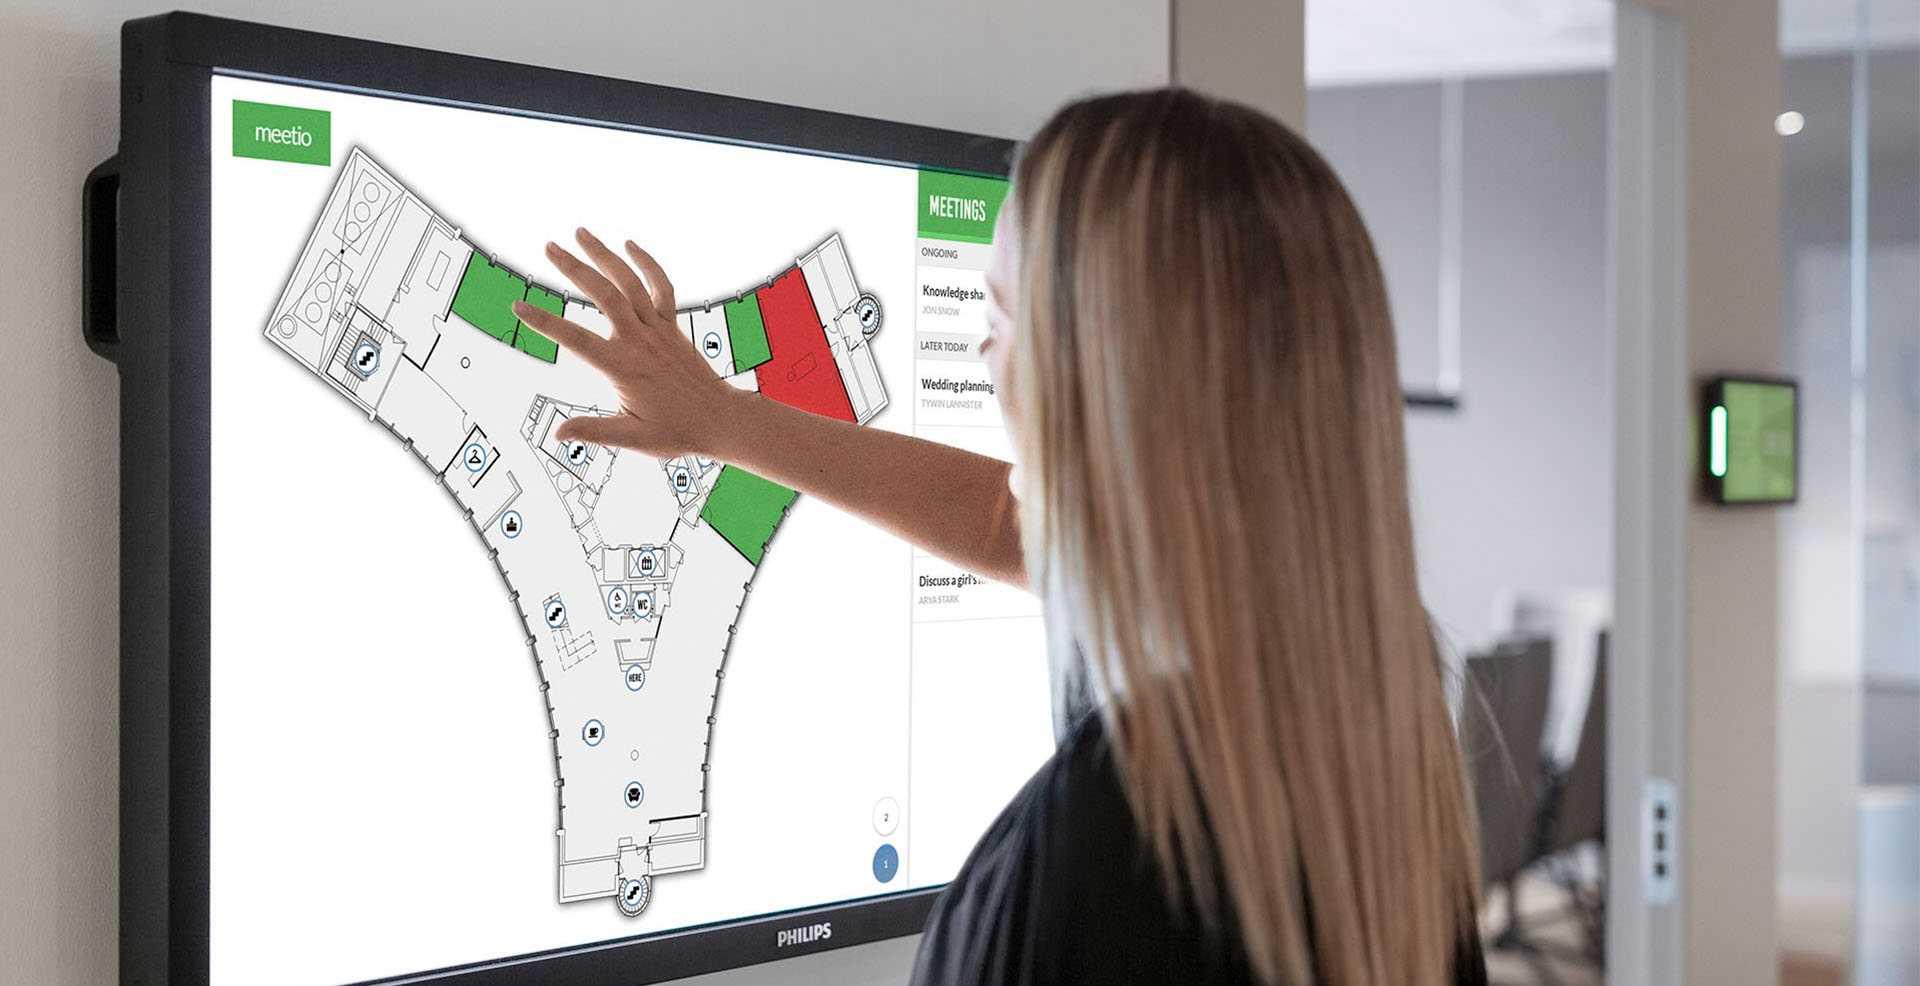 Meetio View screen with floor plan map